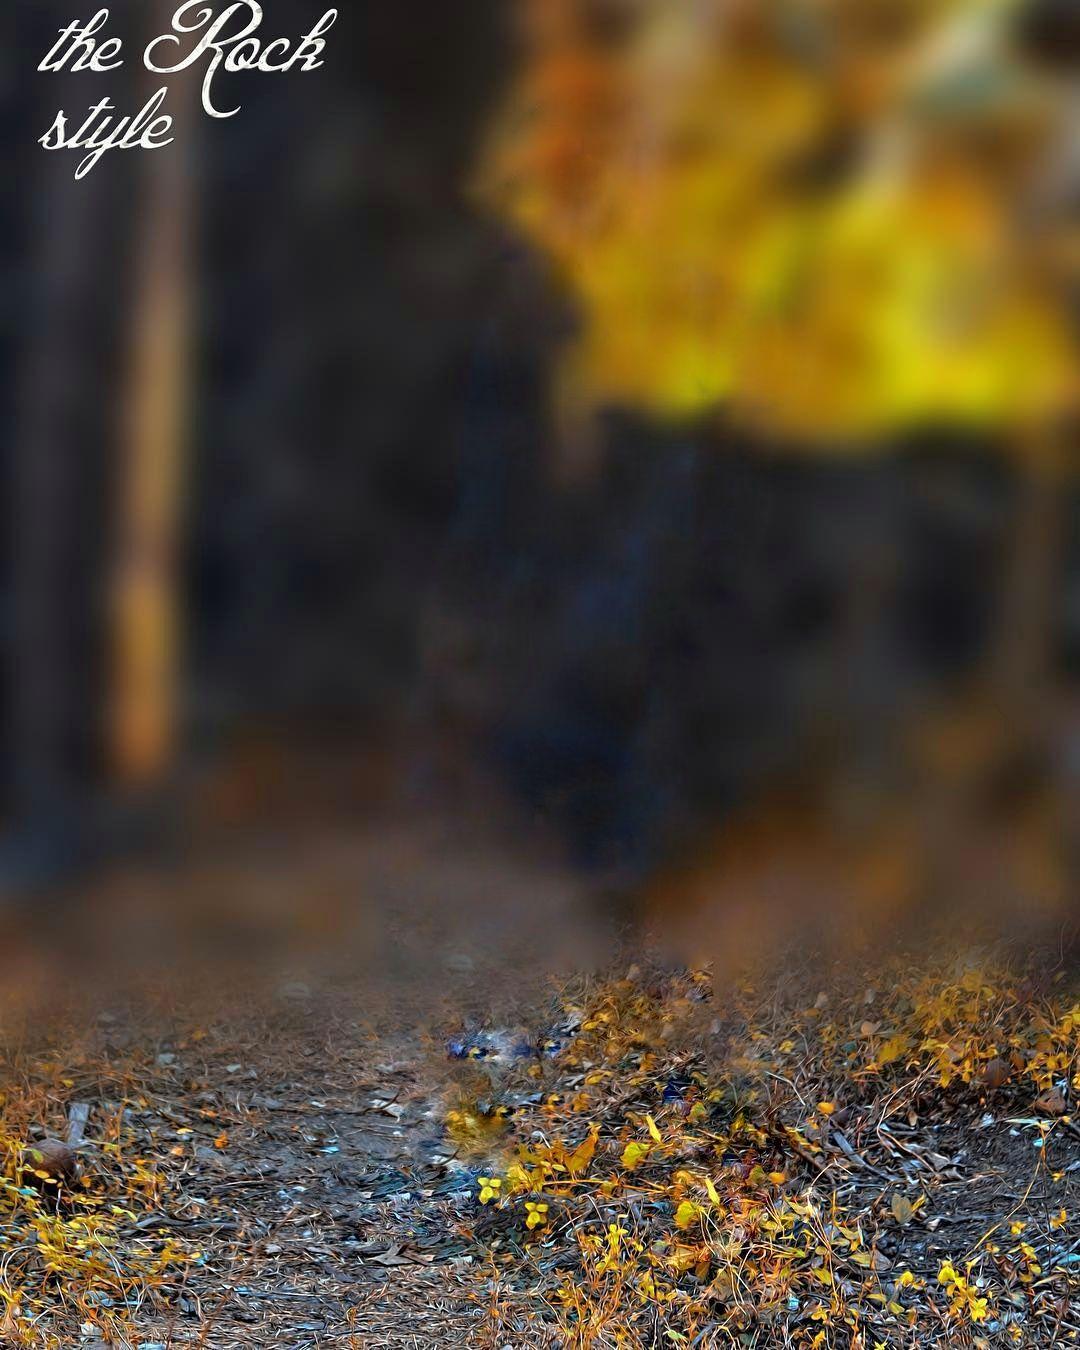 New ] CB Background Download 2018, Picsart CB Background